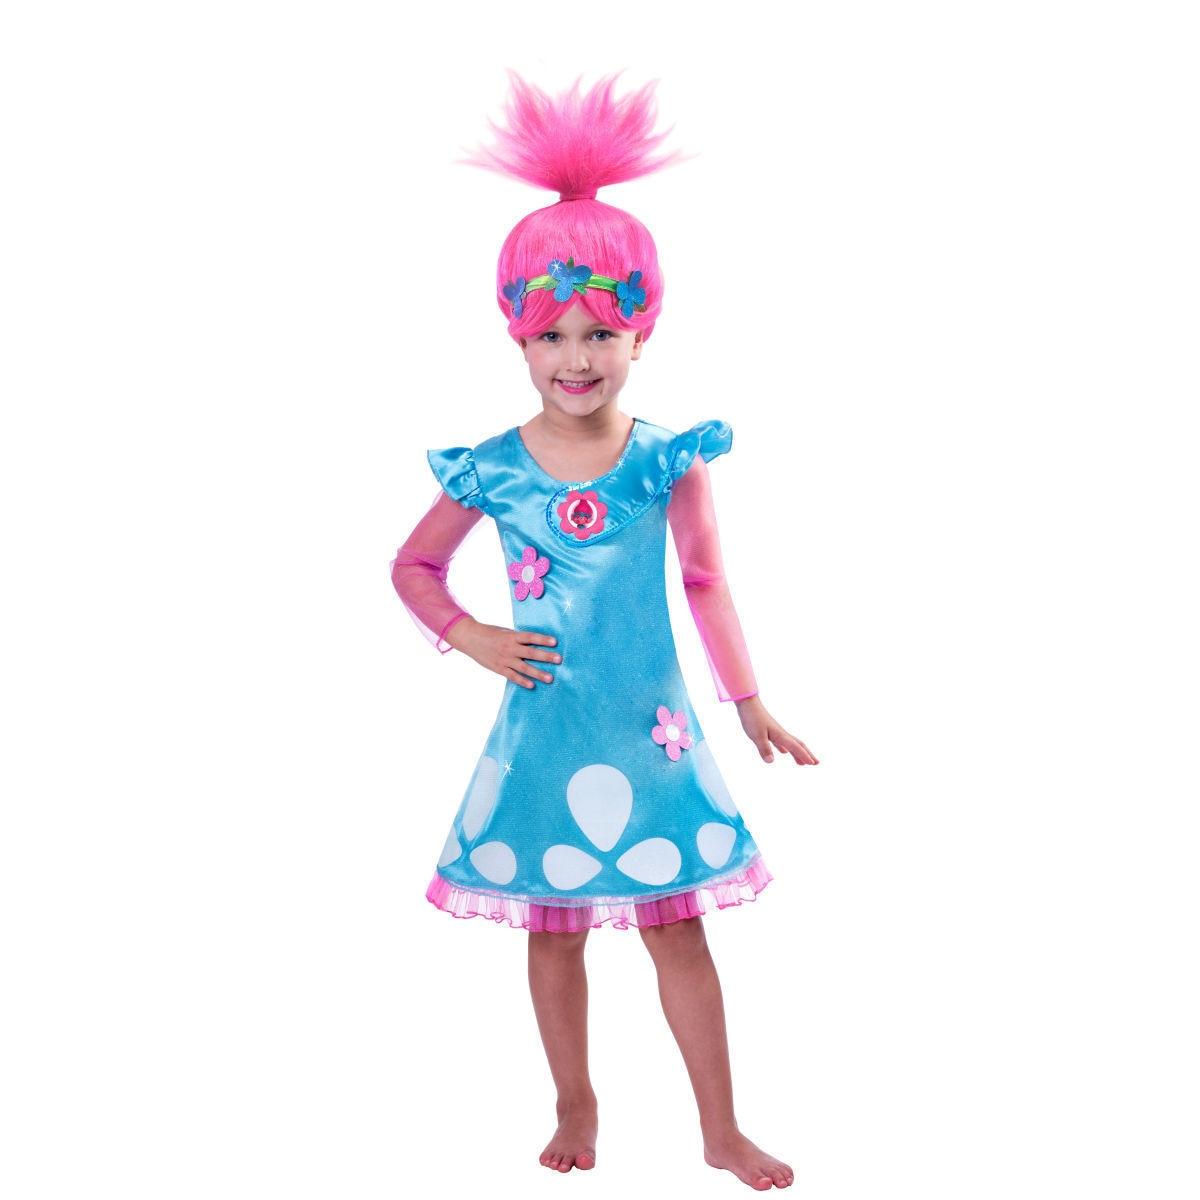 Baby girls Wearing a wig Summer Trolls Dress Christmas Costumes For Girls Lace Mesh Clothing Children Vampirina necklace Dress